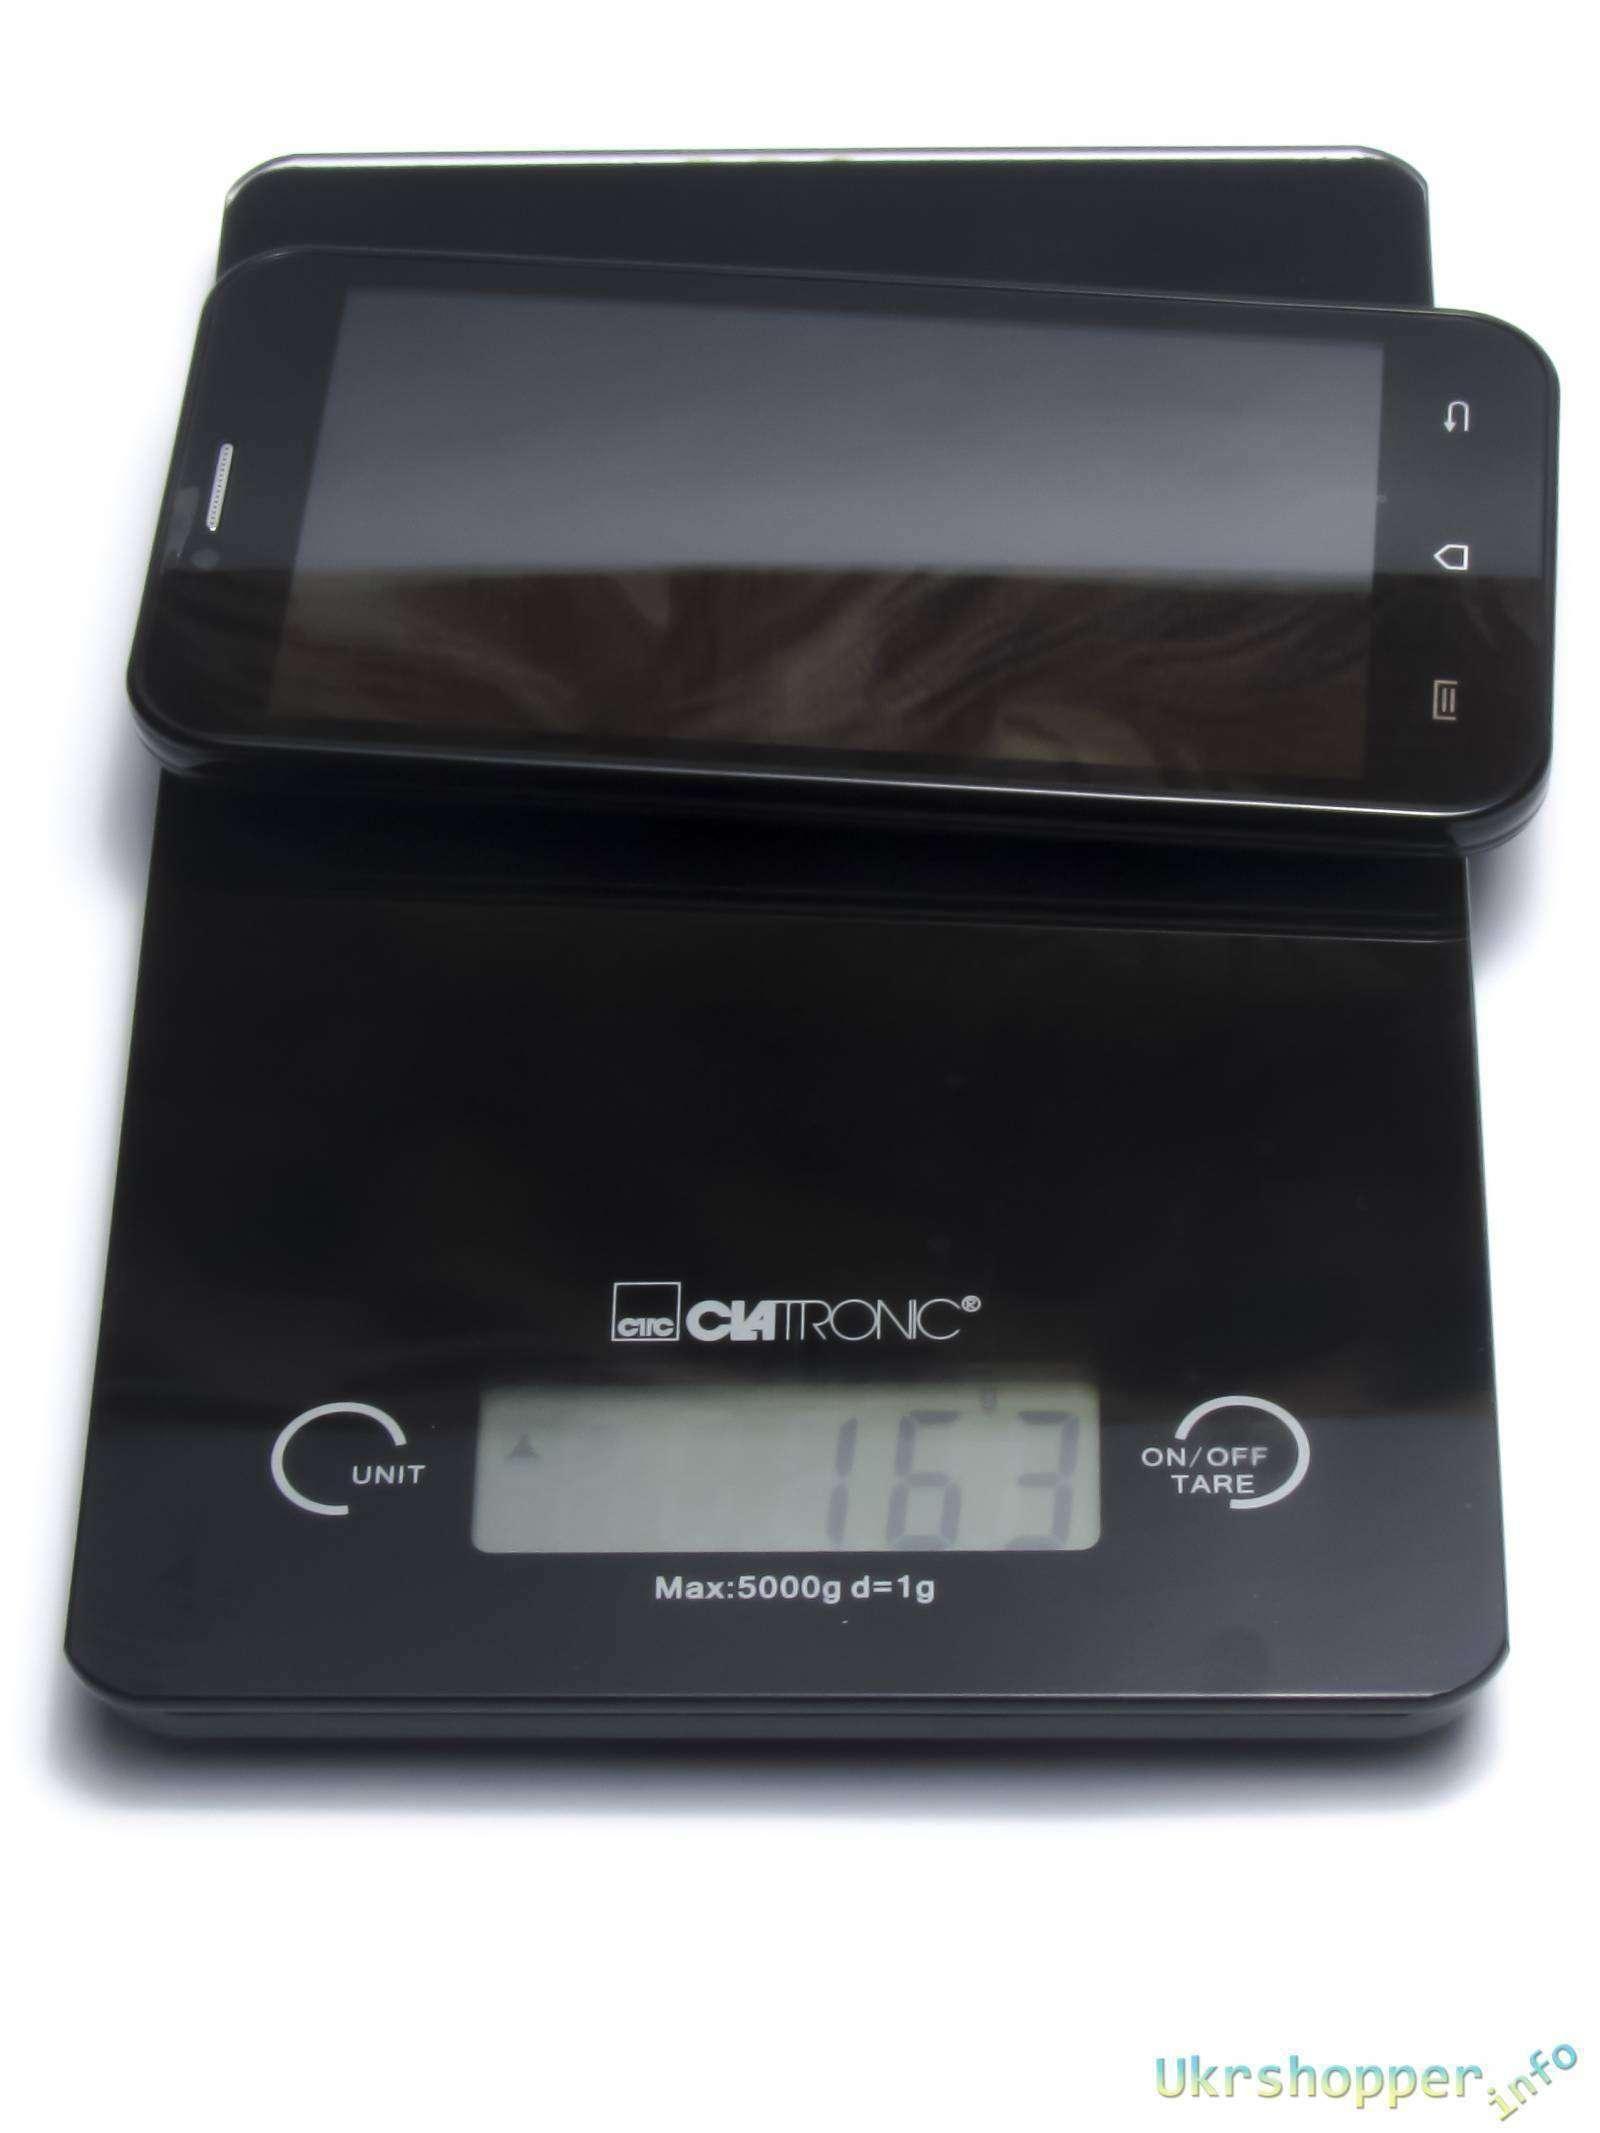 GearBest: Обзор смартфона MPIE C5000 - 5.0, MTK6572, 1,0 GHz, Android 4.4.2